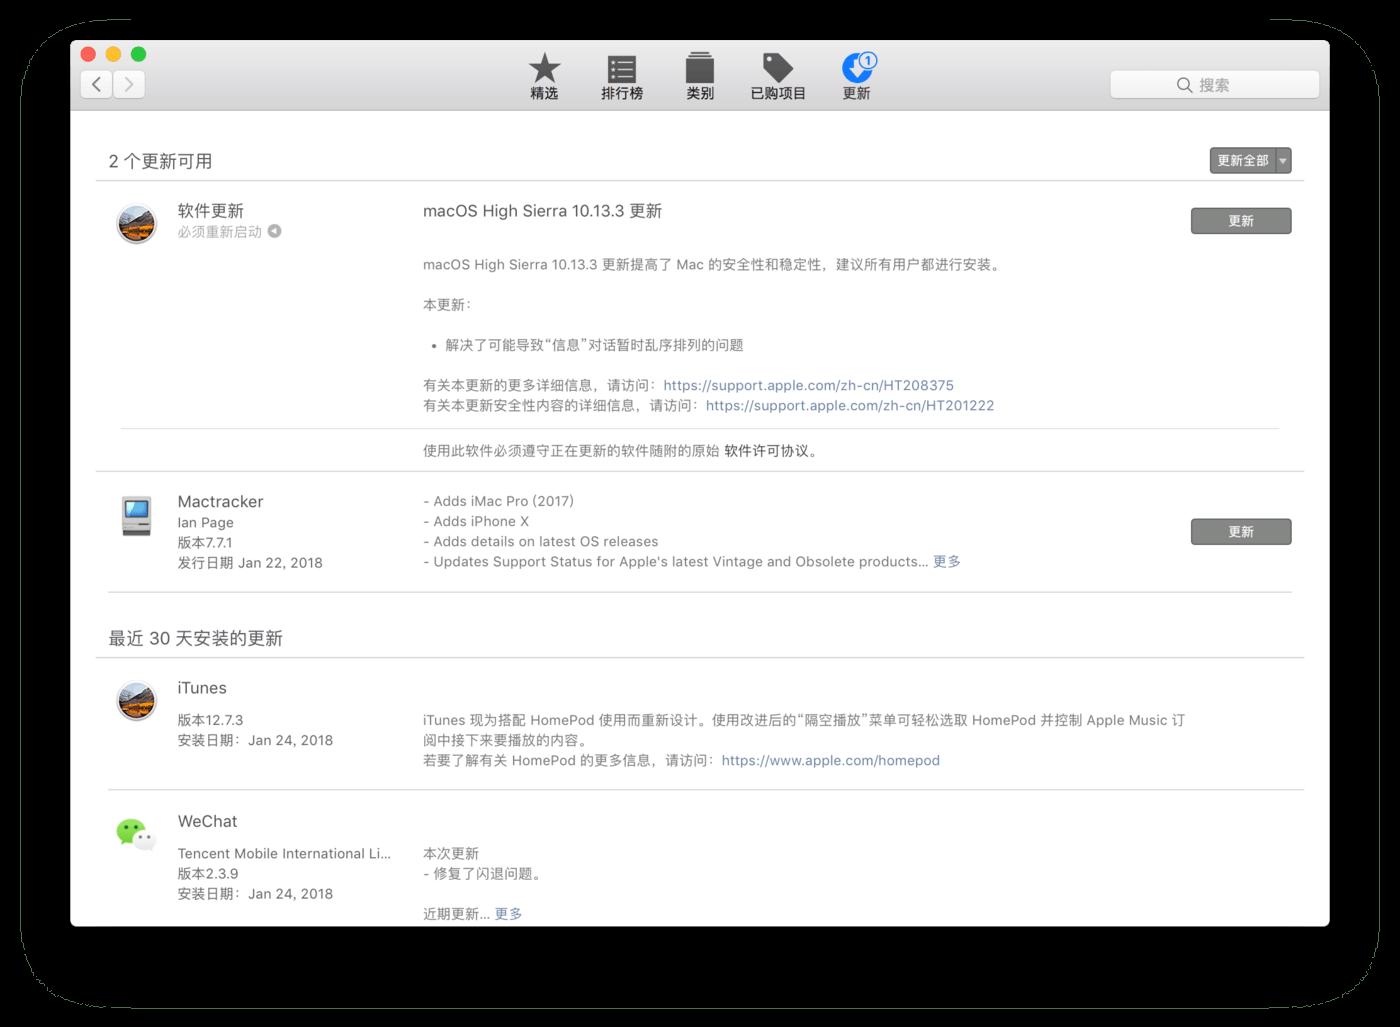 升级 macOS High Sierra 10.13.3 正式版